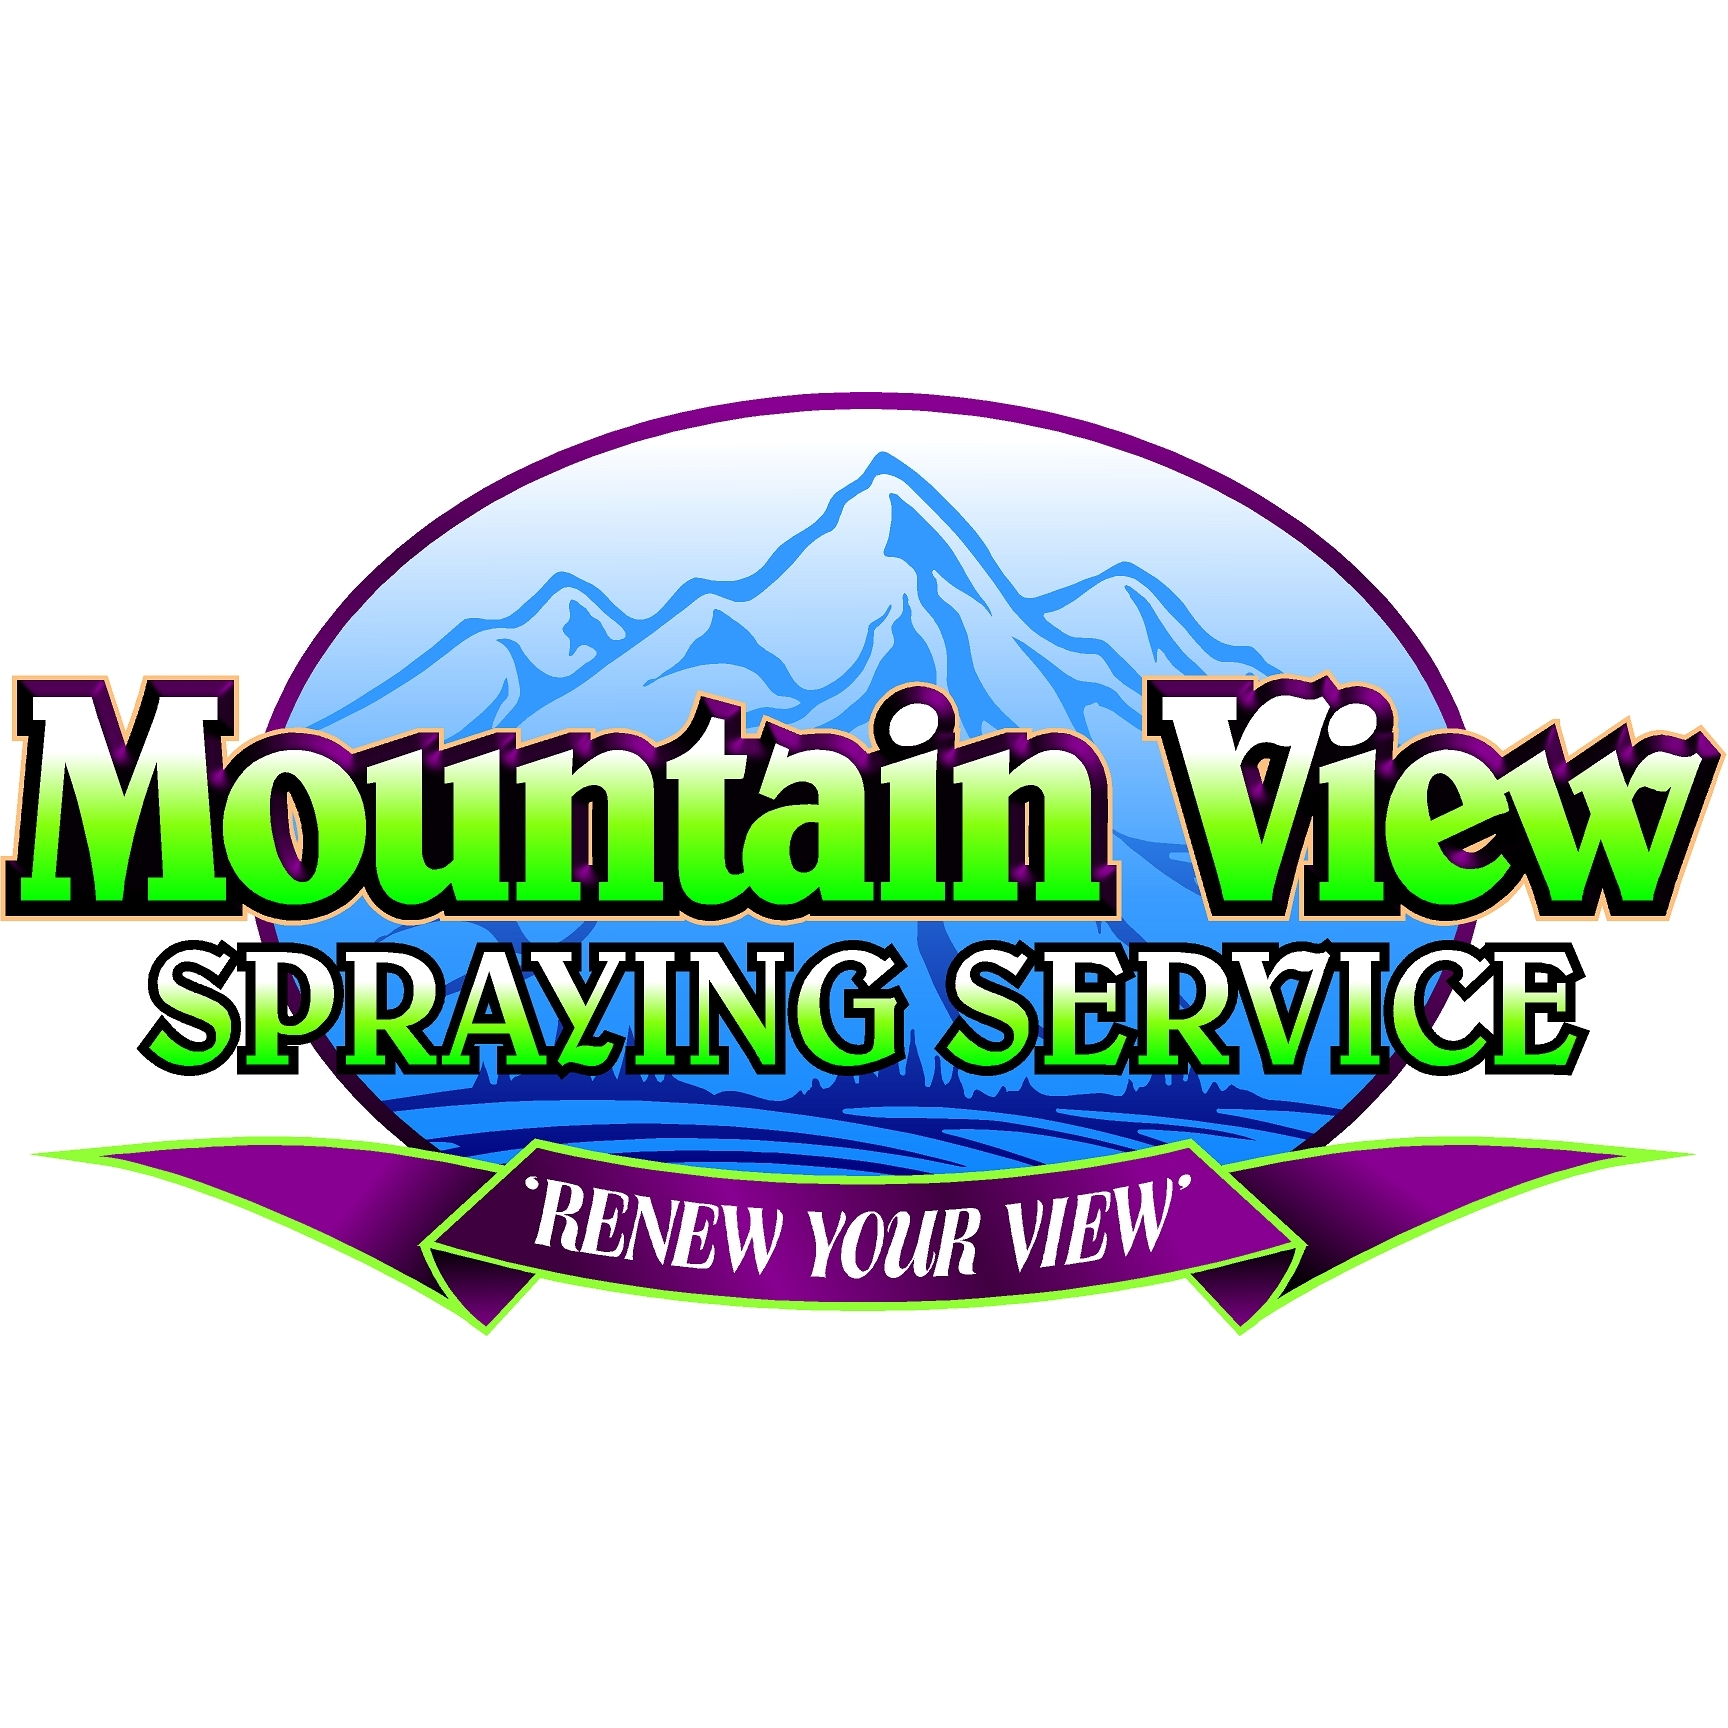 Mountain View Spraying Service